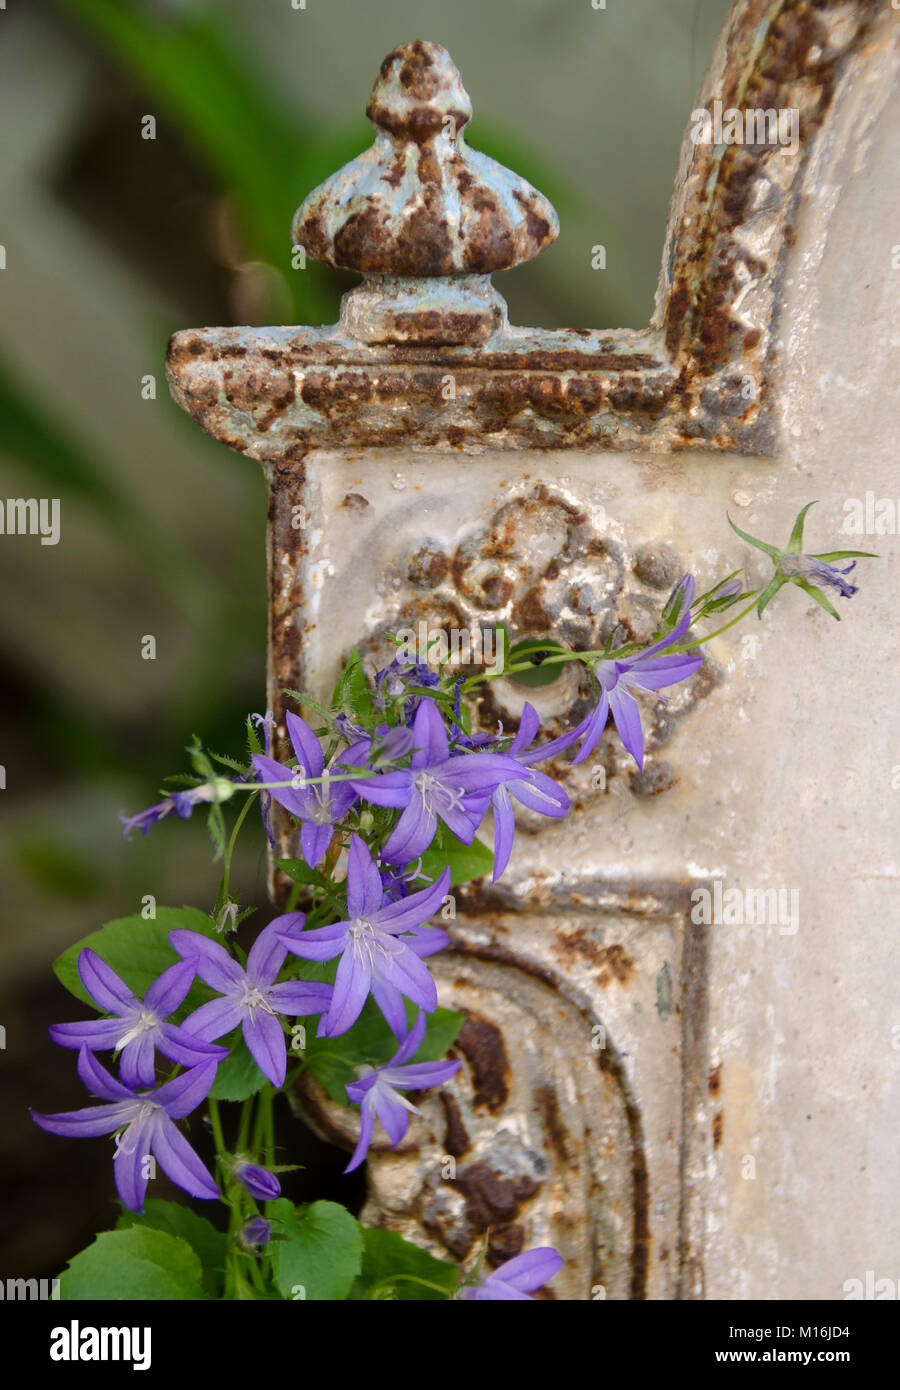 Antikes Ornament mit Glockenblume - Stock Image